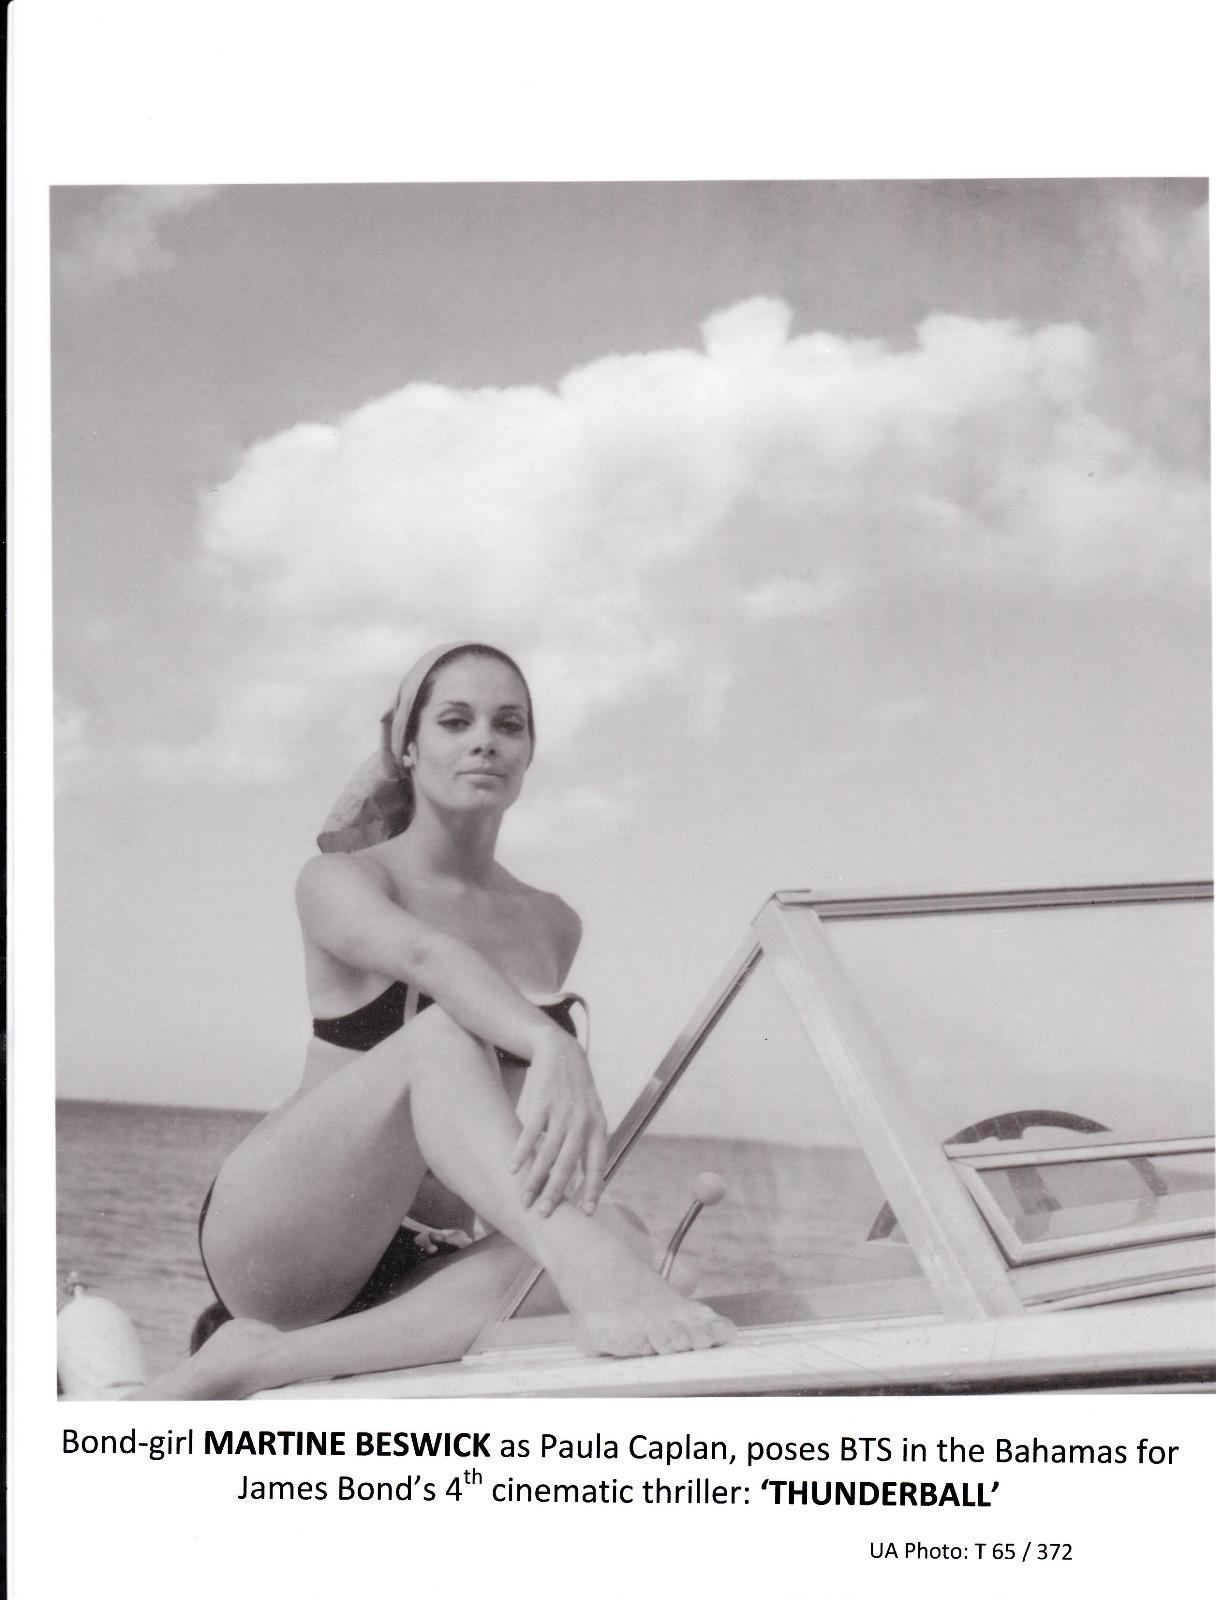 Martine Beswick nudes (84 photo), Sexy, Paparazzi, Boobs, legs 2018